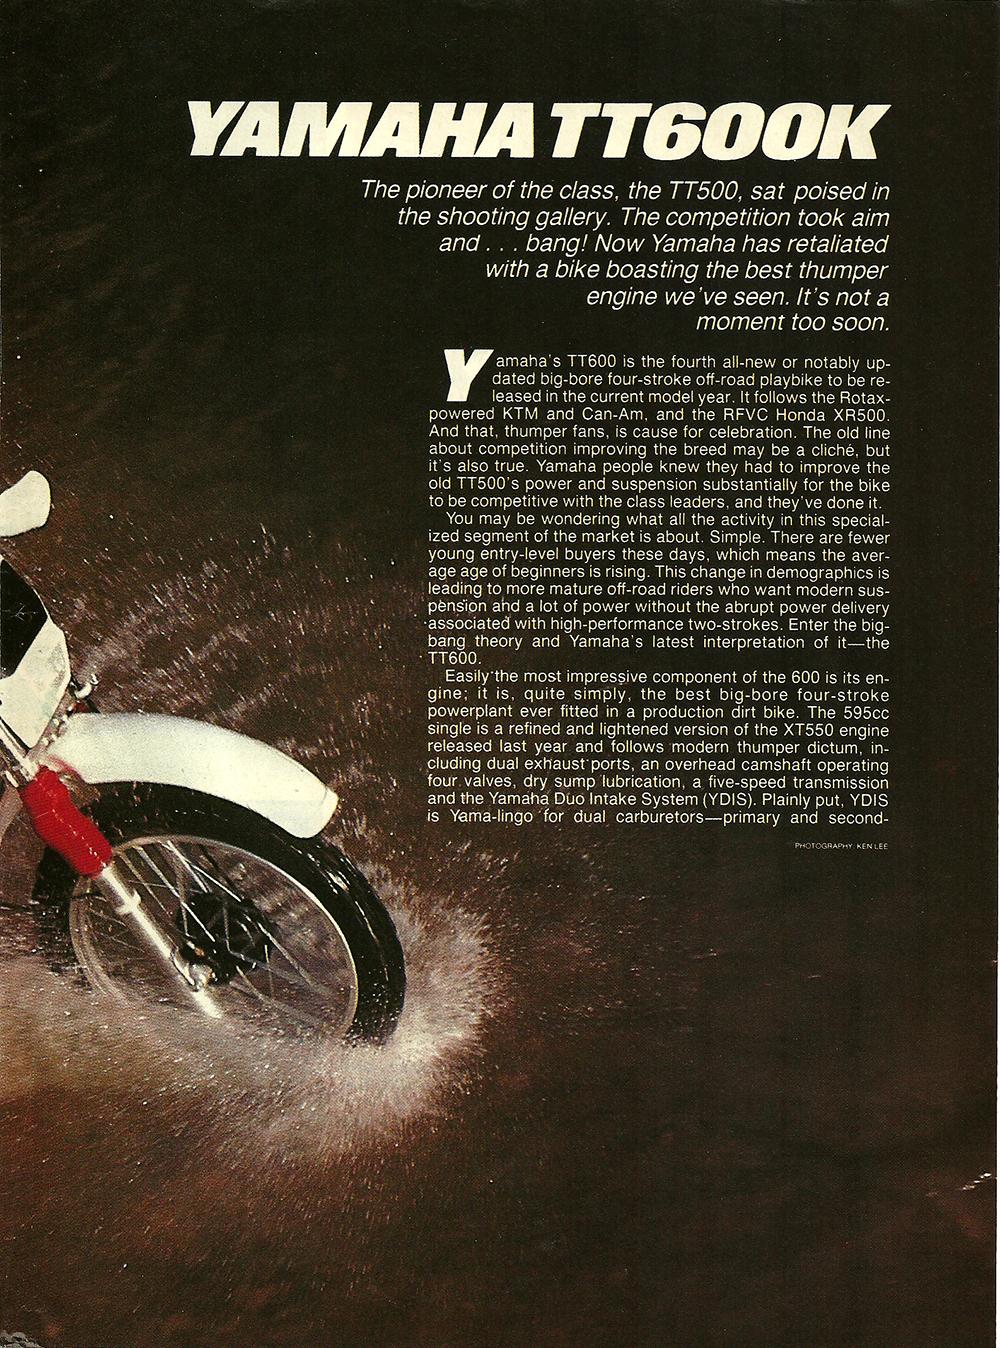 1983 Yamaha TT600K off road test 2.jpg